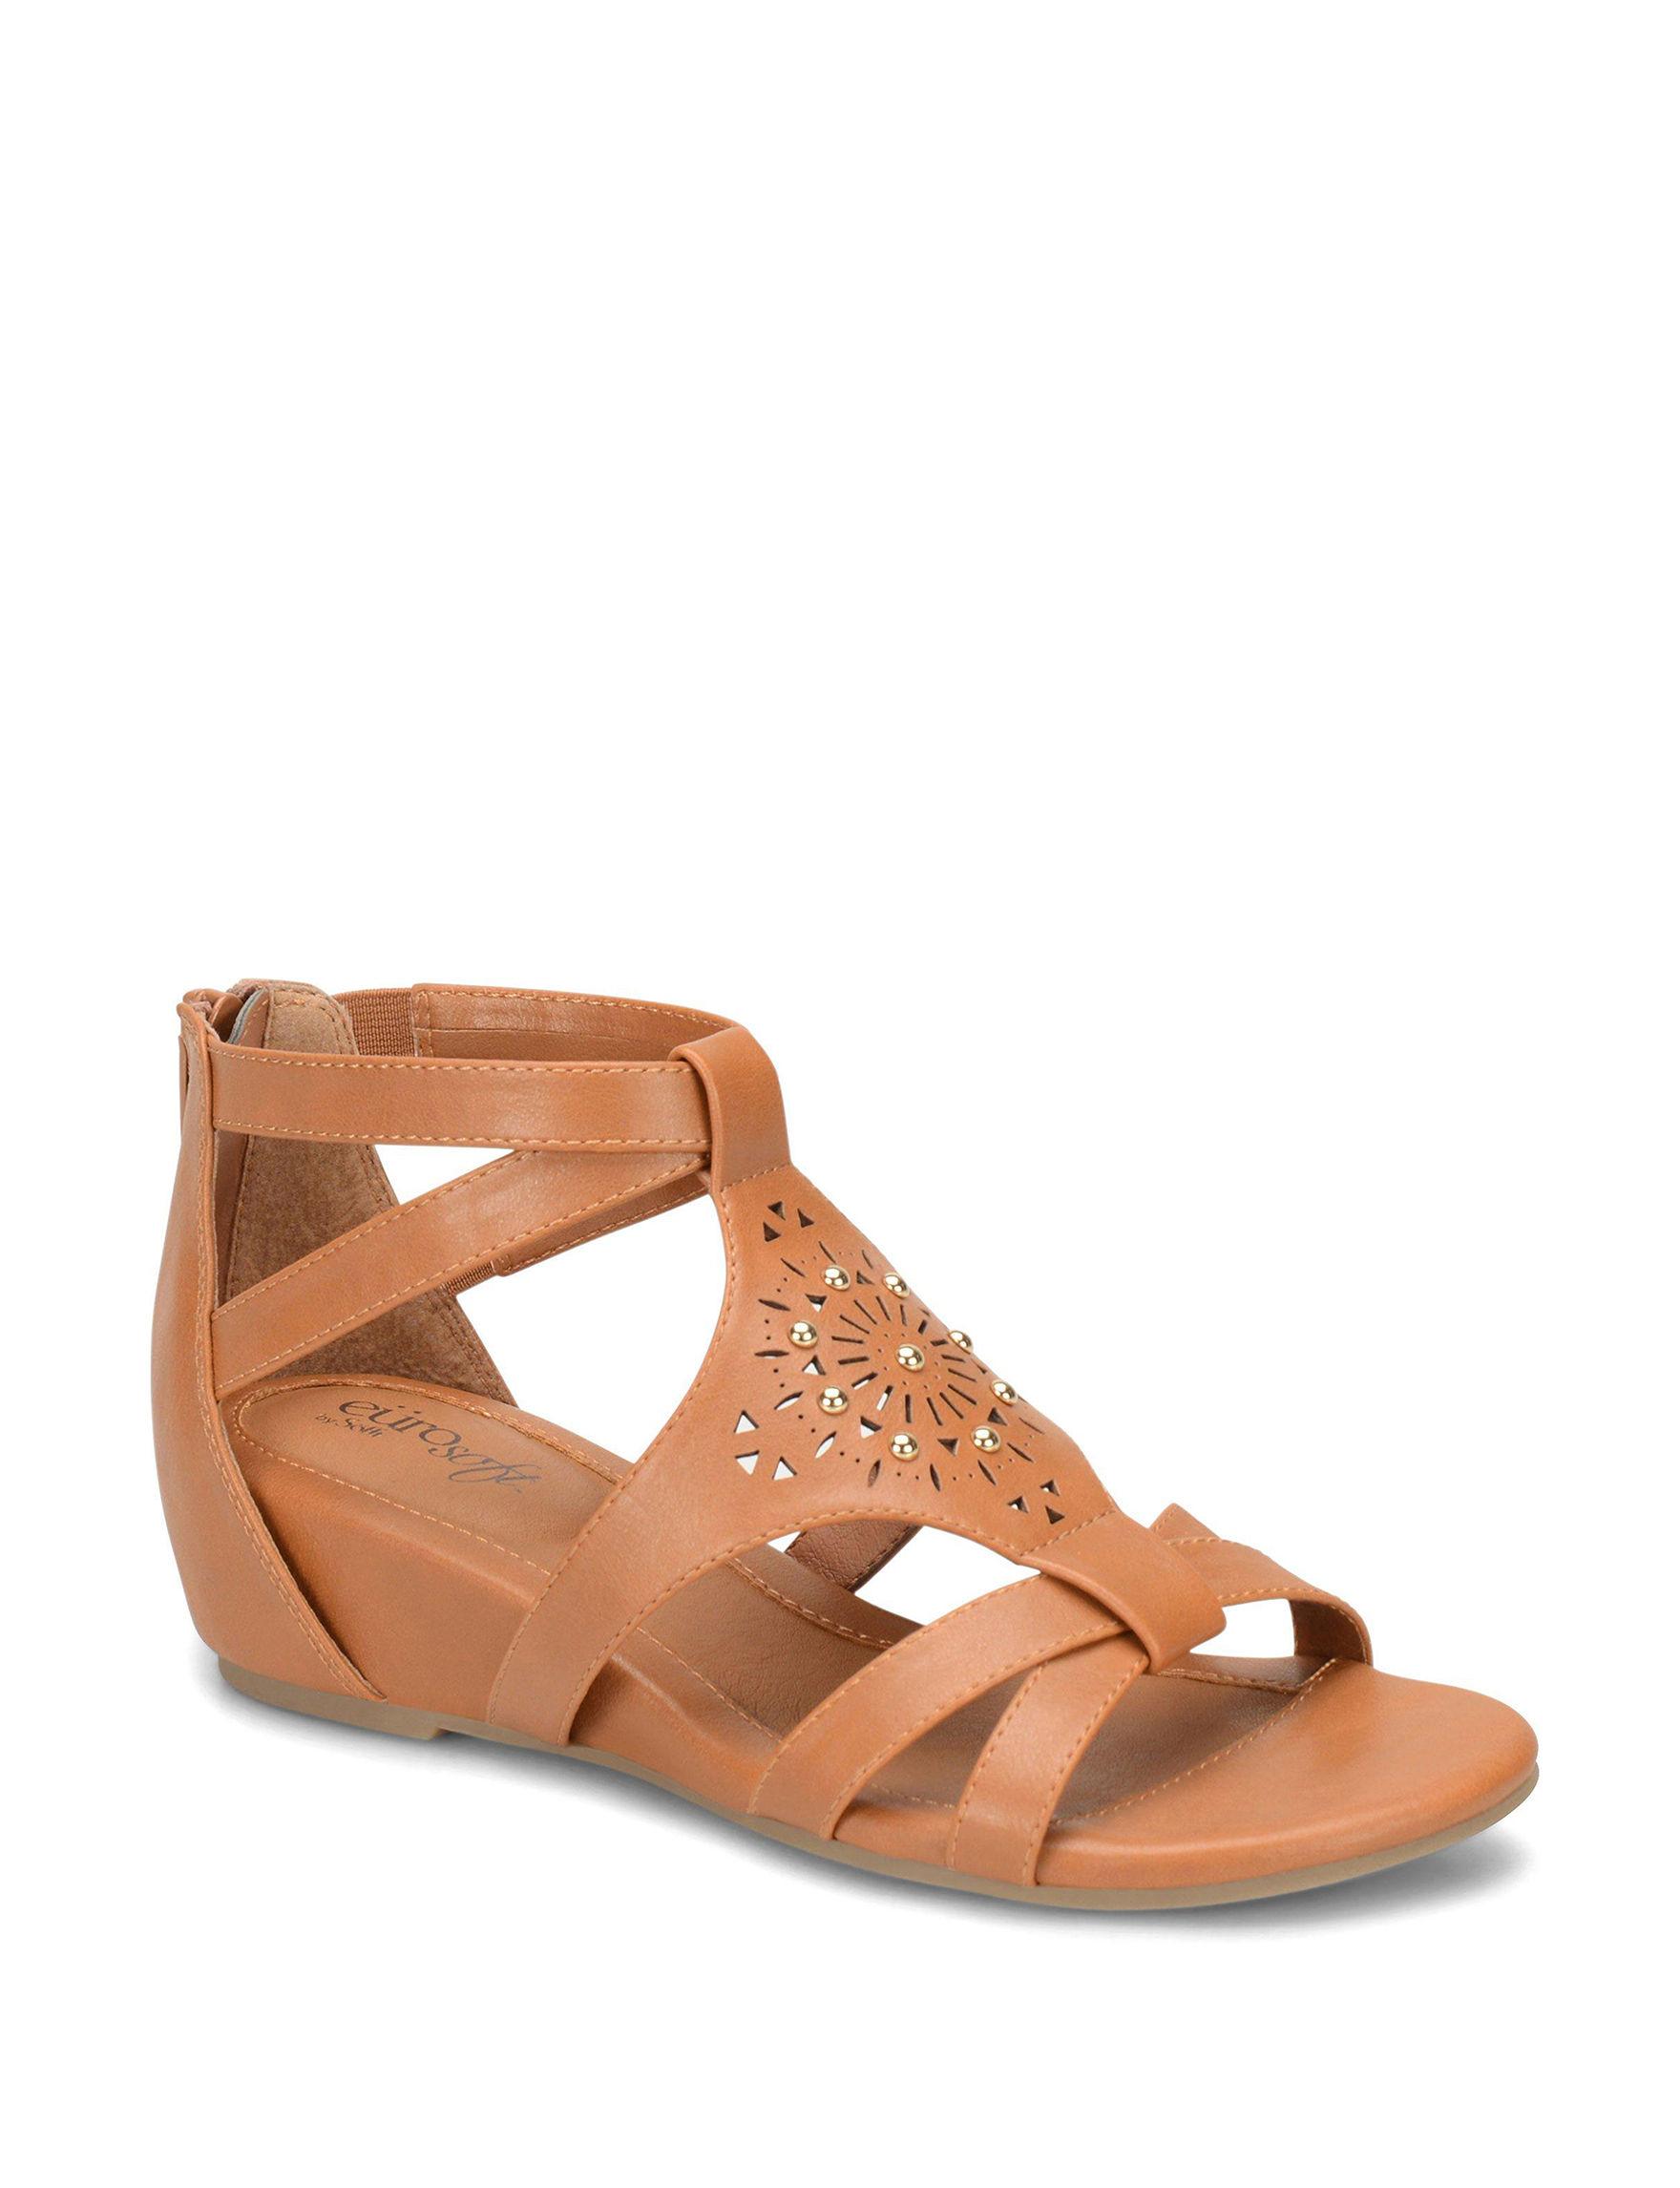 Eurosoft Brown Gladiators Wedge Sandals